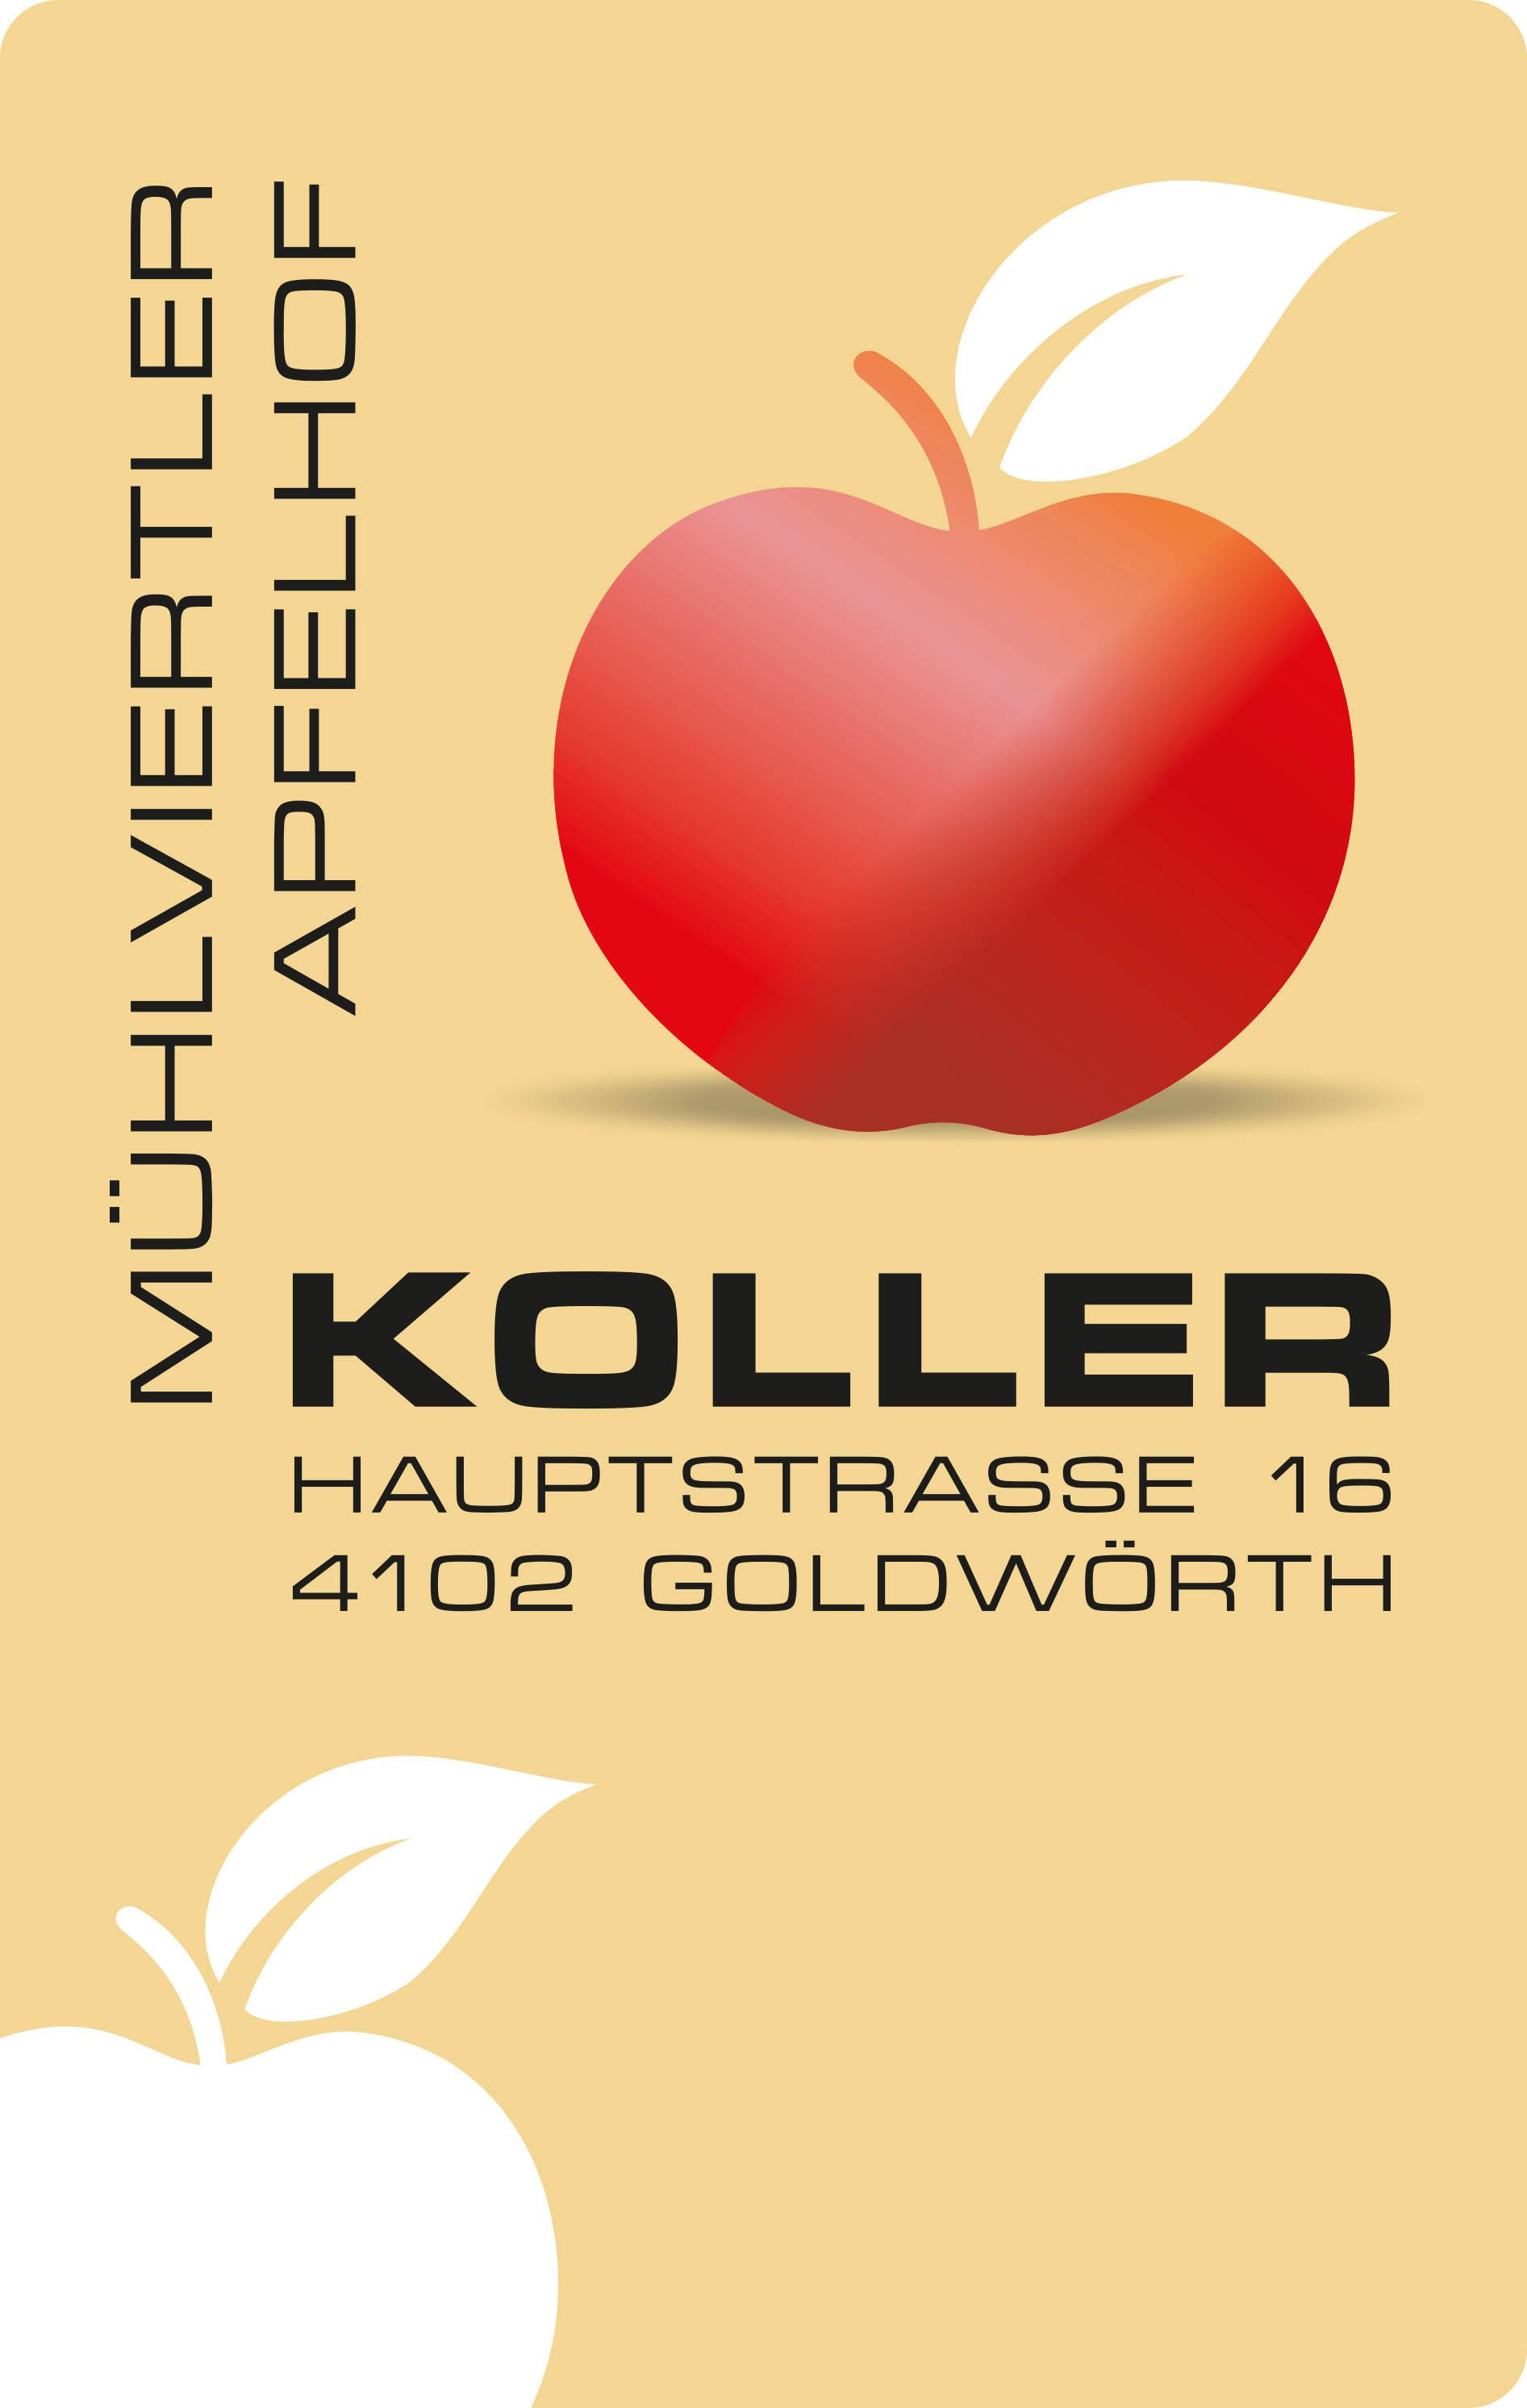 Apfelhof Koller